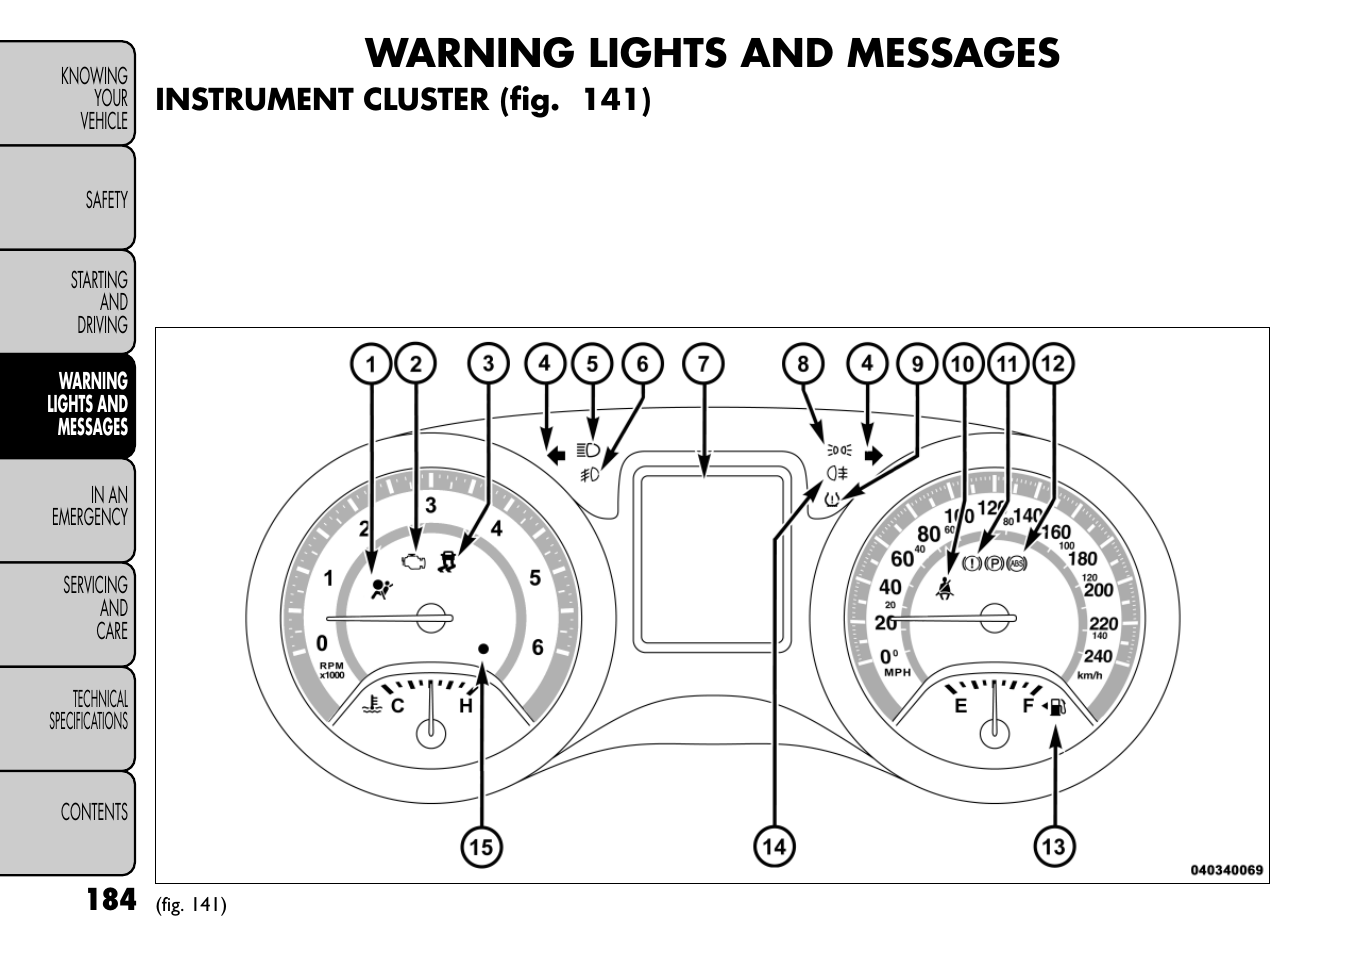 Warning lights and messages, Instrument cluster (fig. 141